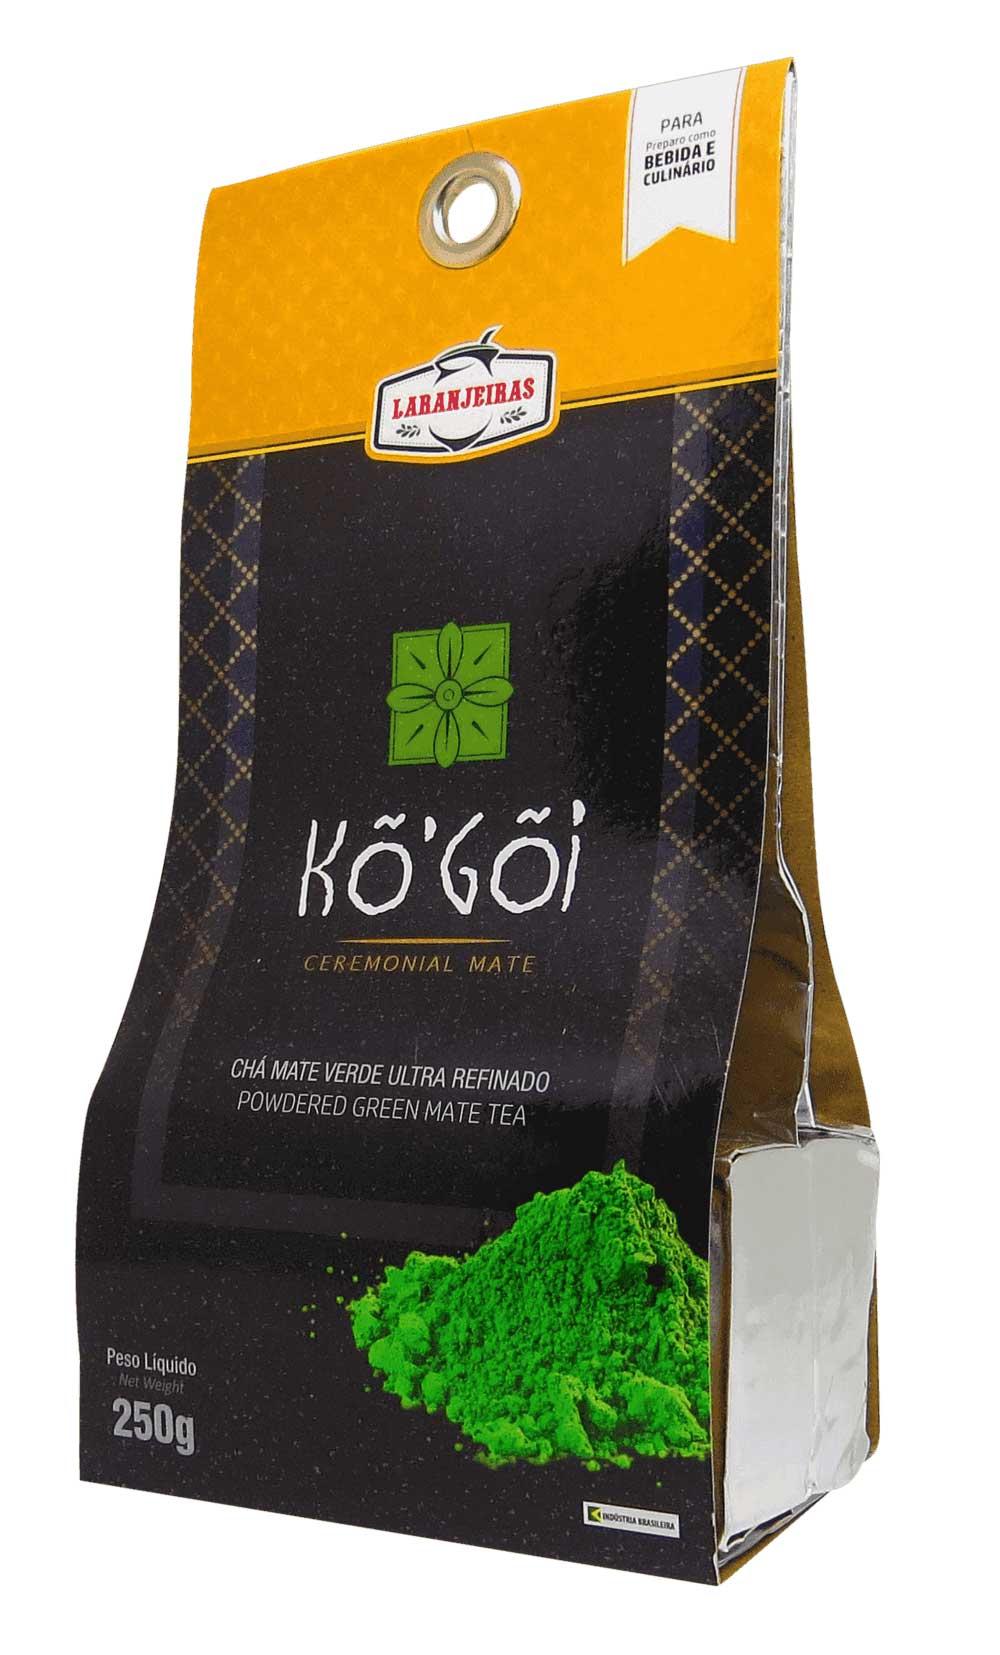 KÔ'GÕI Ceremonial Mate - Chá Mate Verde Ultra Refinado - 250g